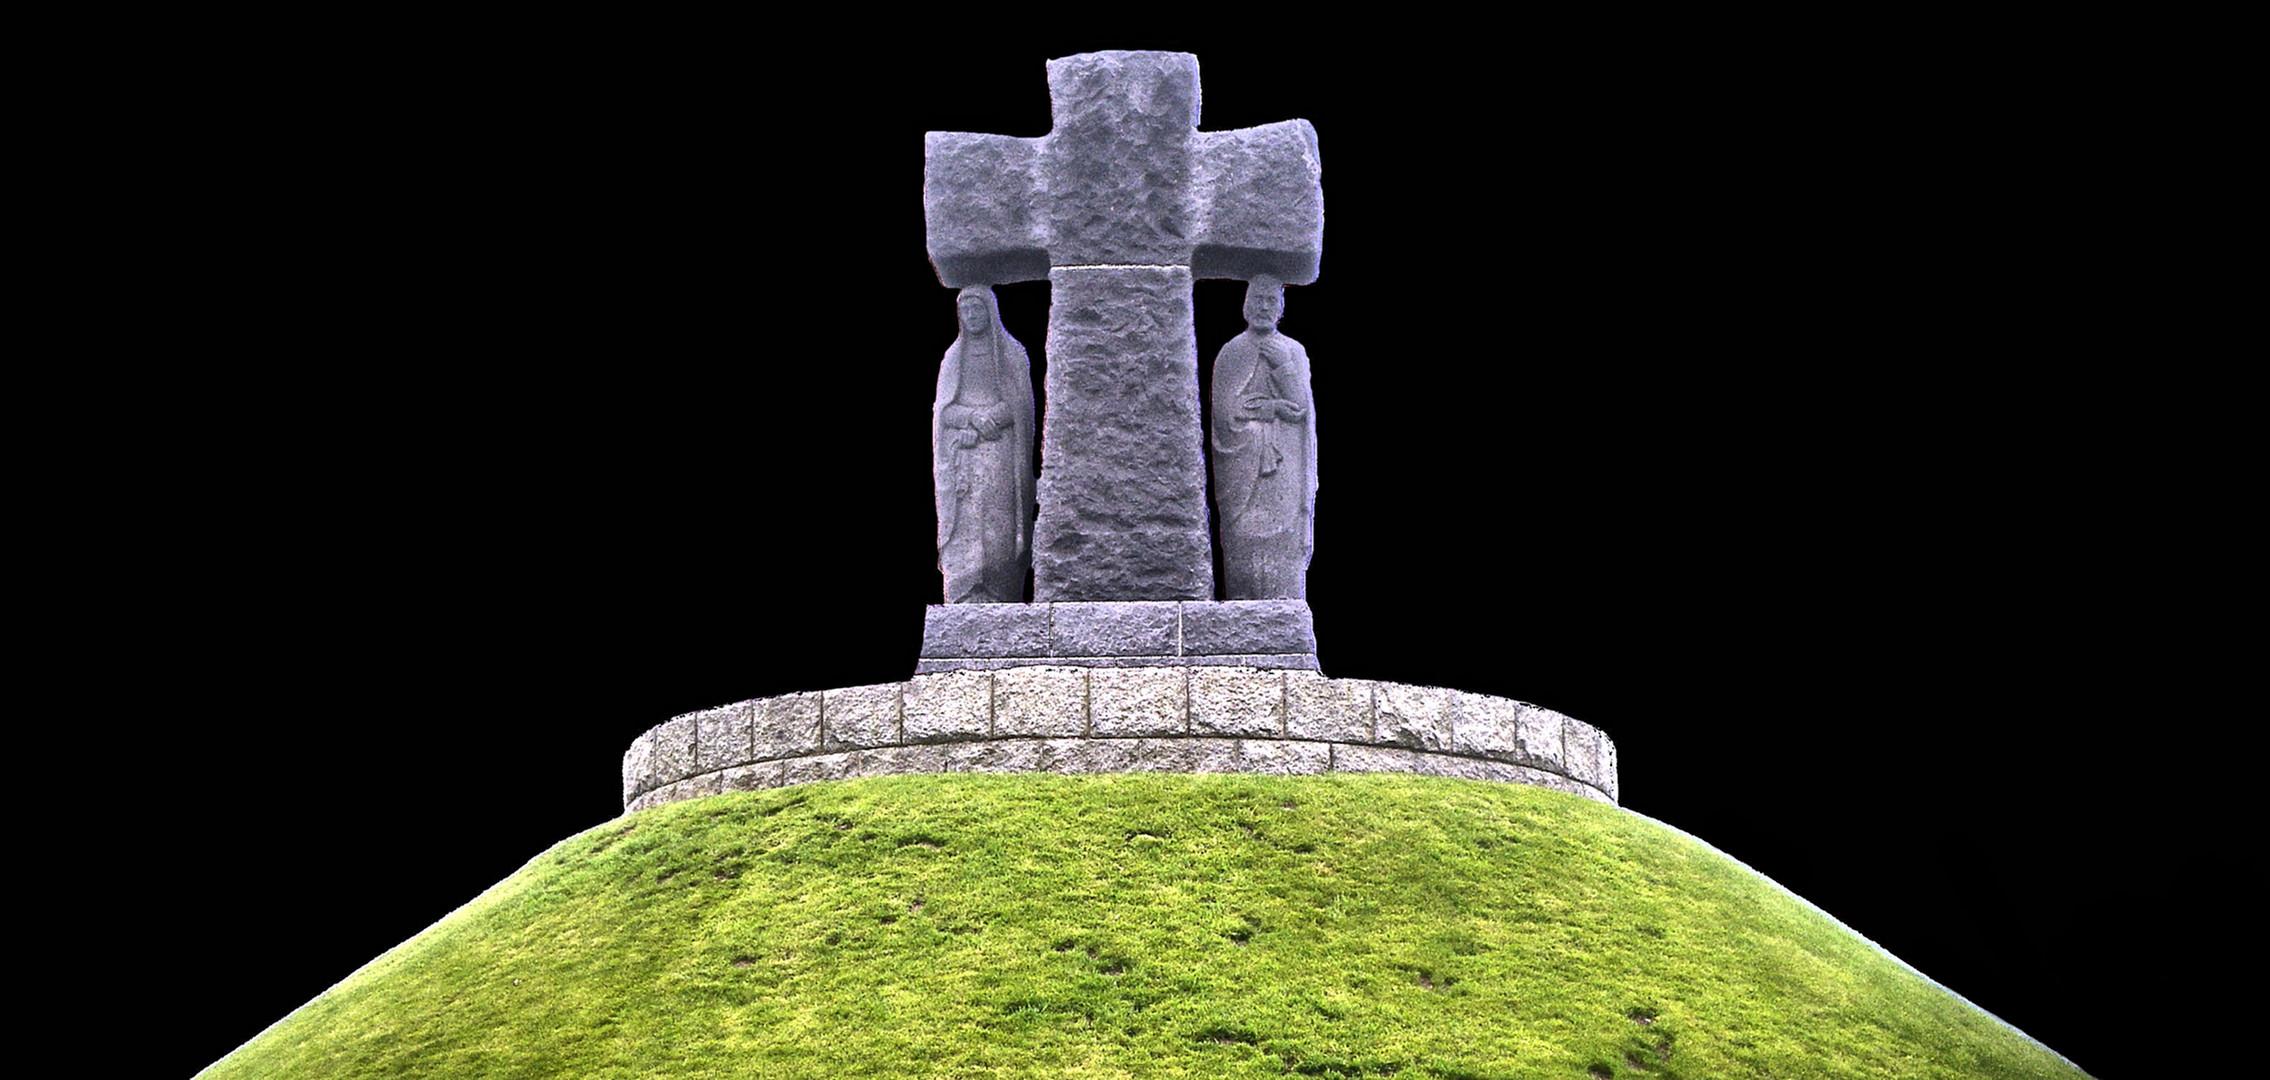 croix d'un cimetiere allemand en normandie (debarquement)